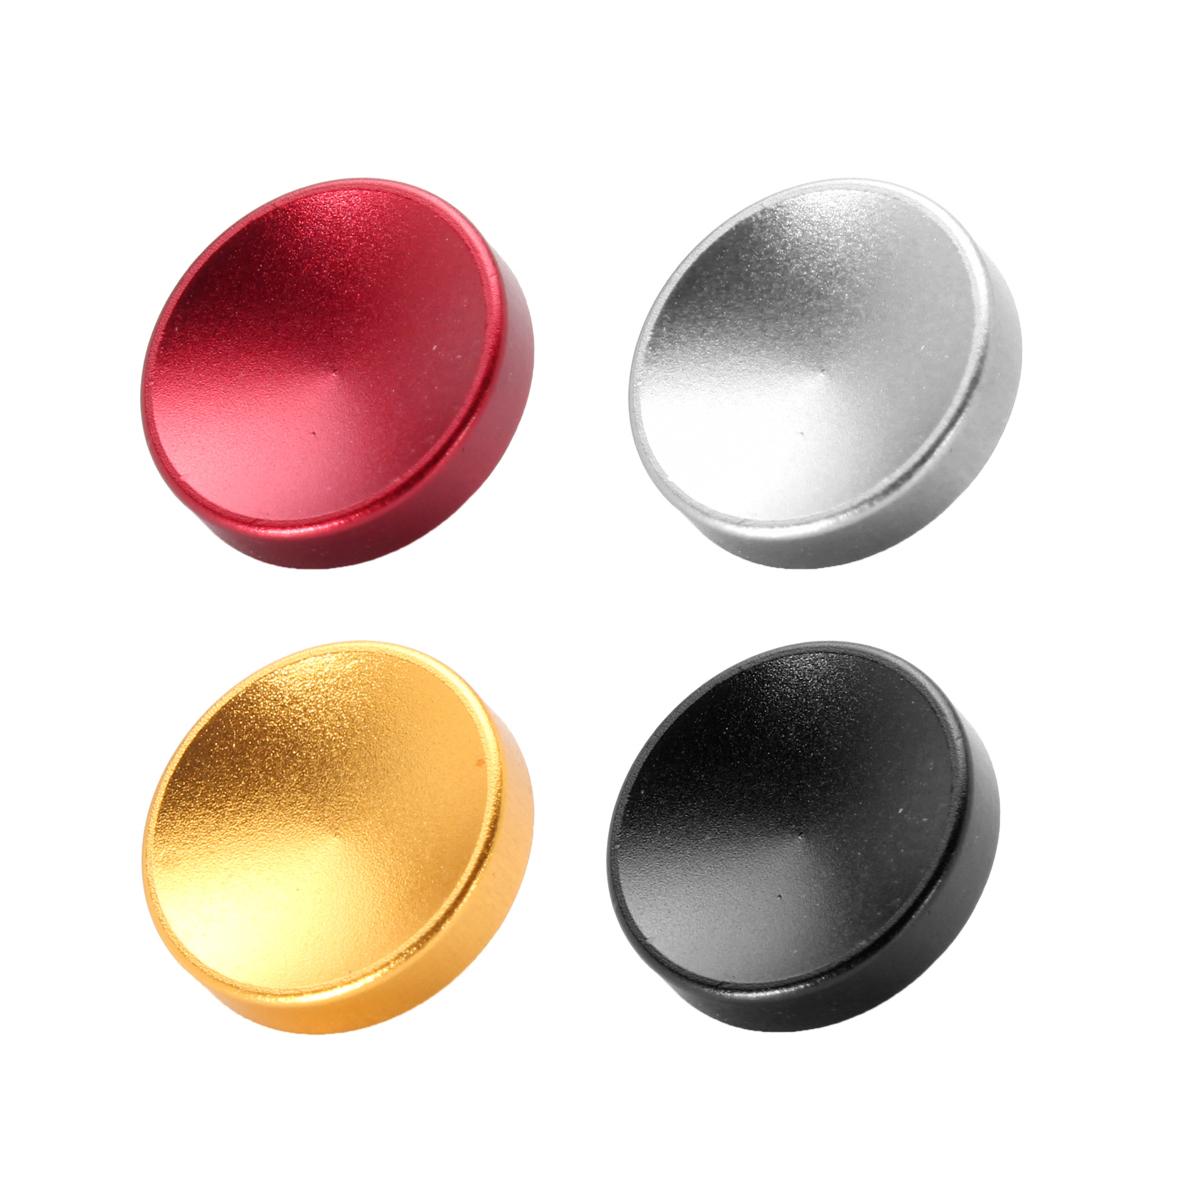 Camera Concave Shutter Release Button For Fuji X100 X10